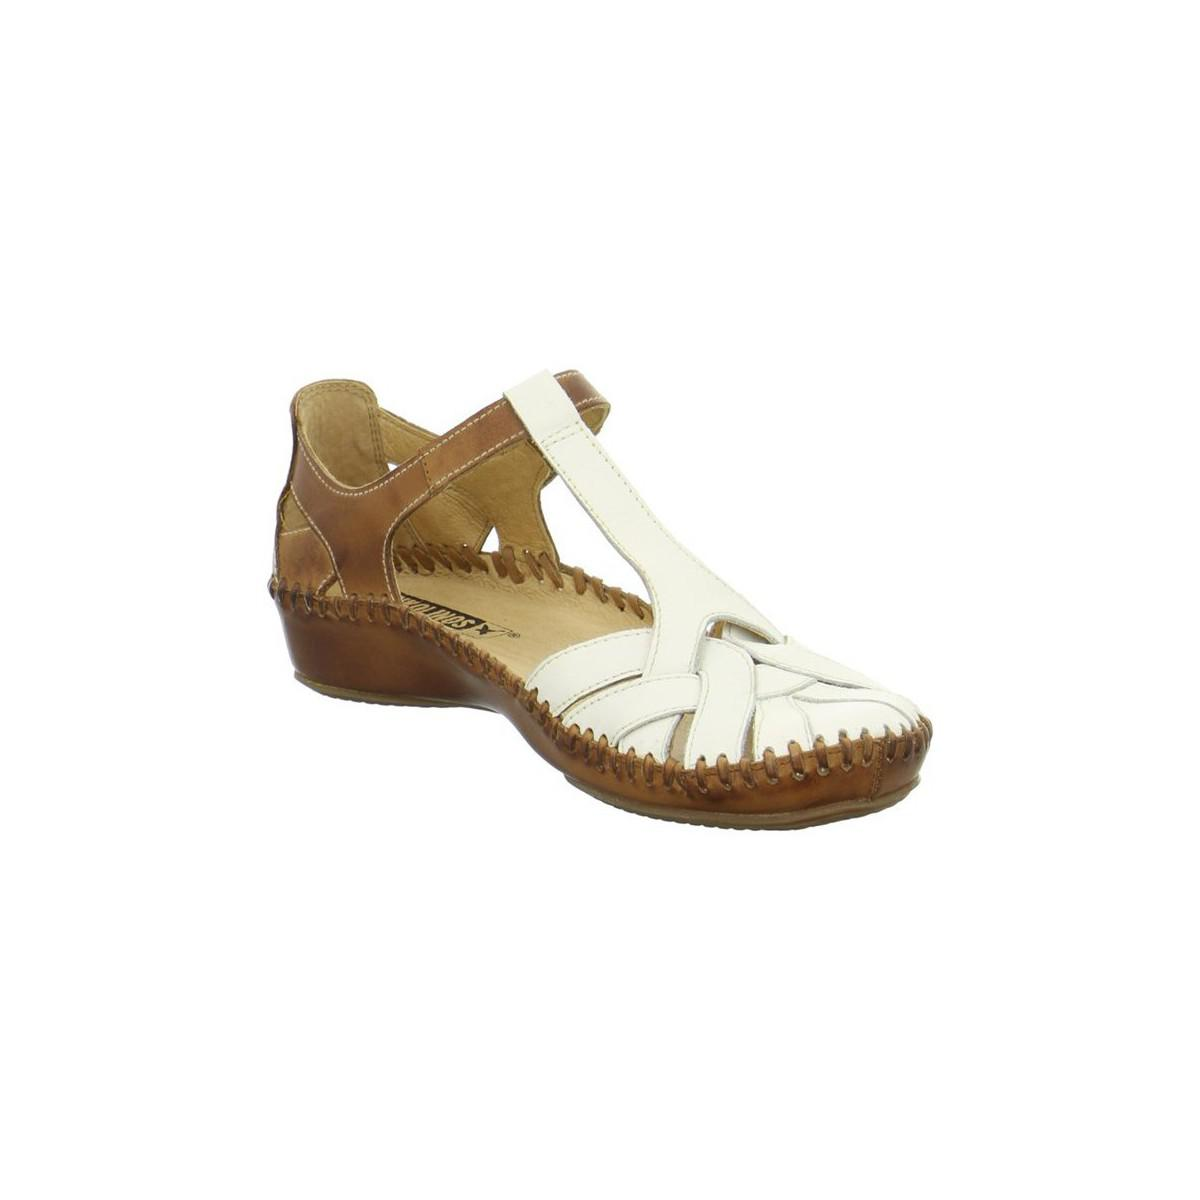 523724e776d608 Pikolinos Nata Women s Sandals In White in White - Lyst